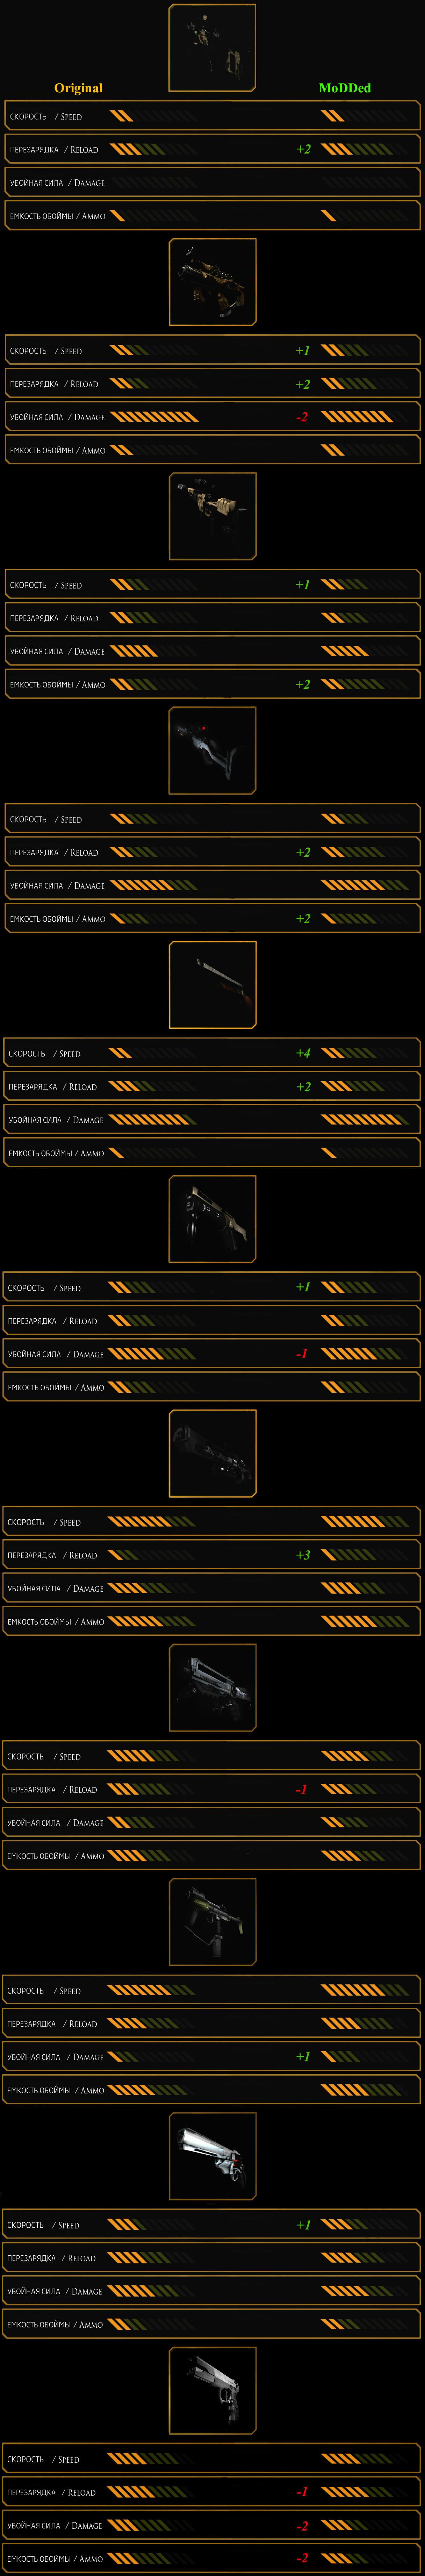 Hardcore Mod Revived - Deus Ex Human Revolution Directors Cut Edition